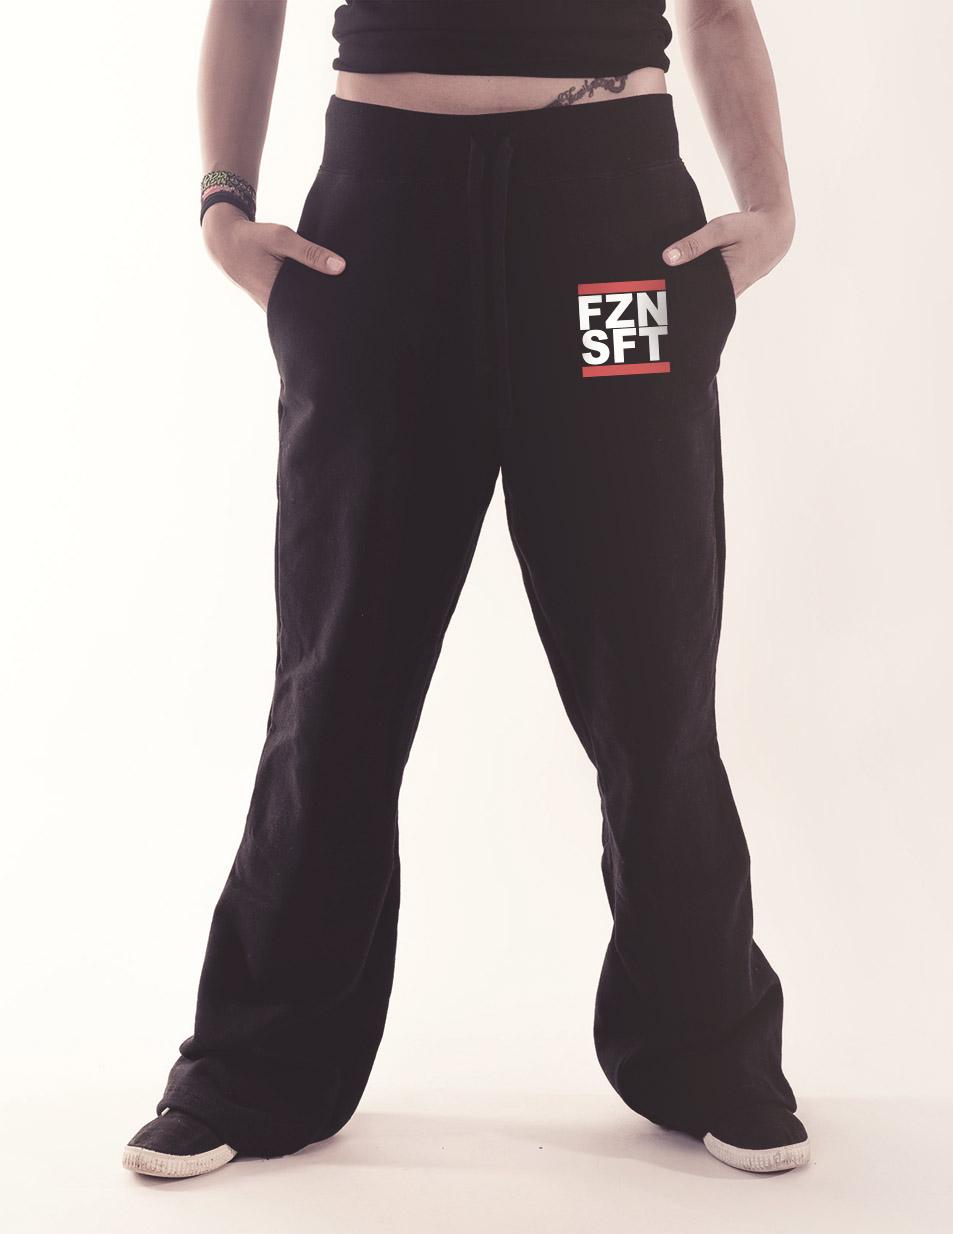 Damen-Jogginghose FZNSFT mehrfarbig auf schwarz